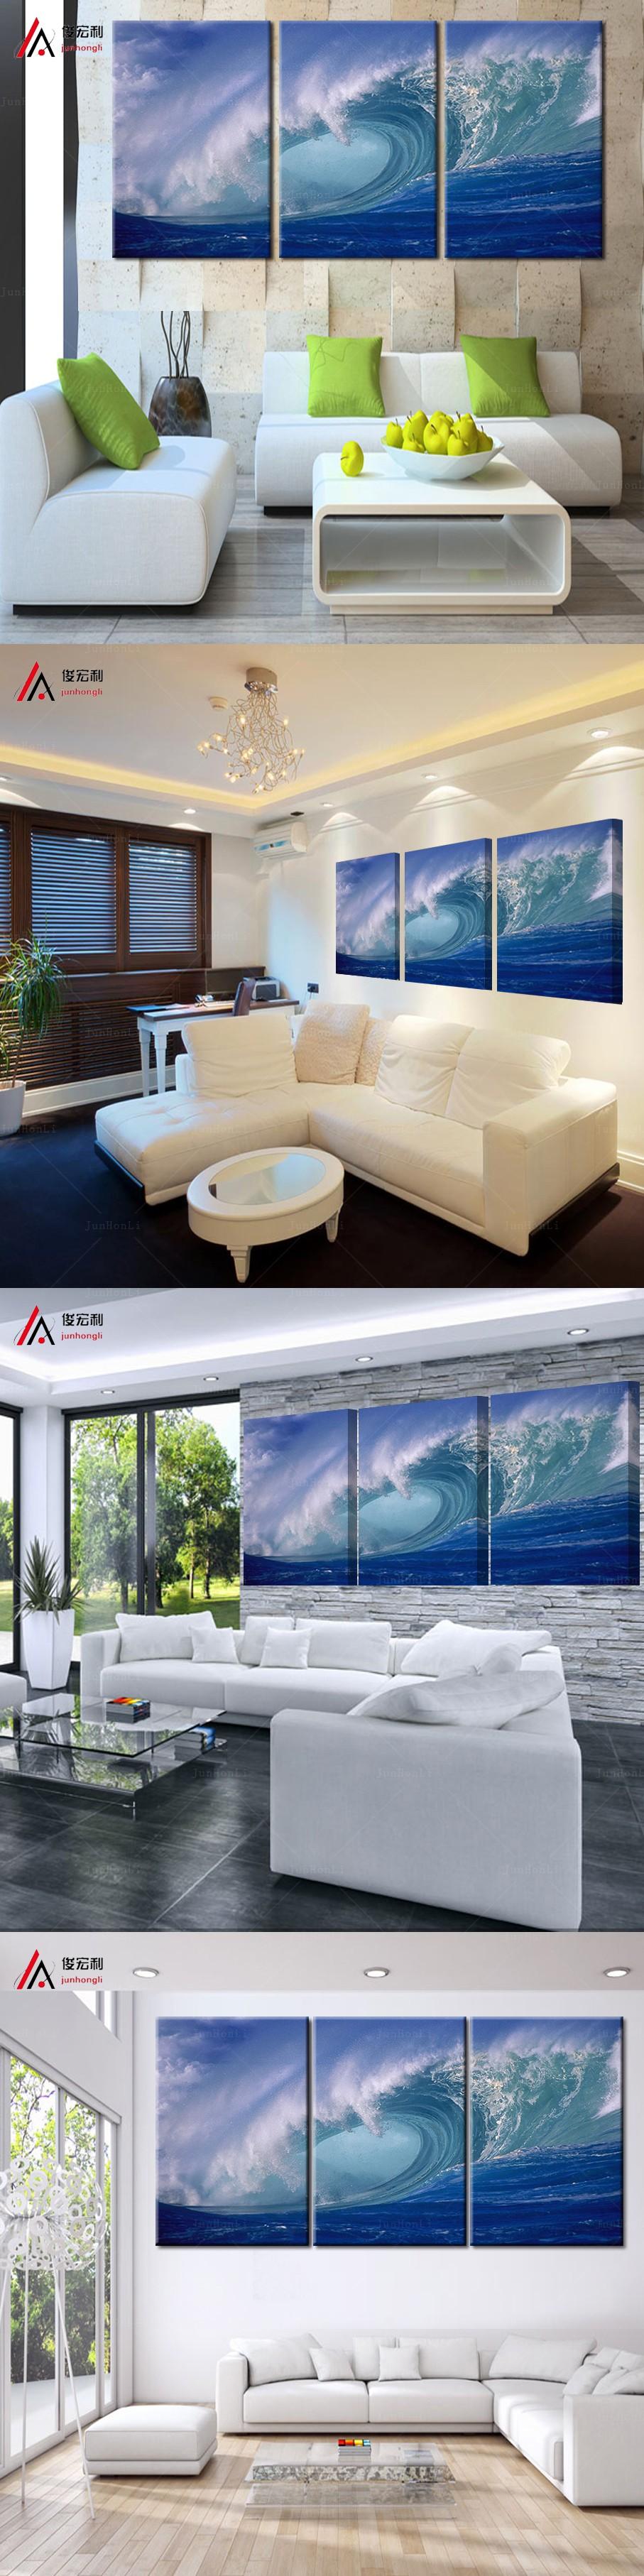 3 Plane Abstract Sea Wave Modern Home